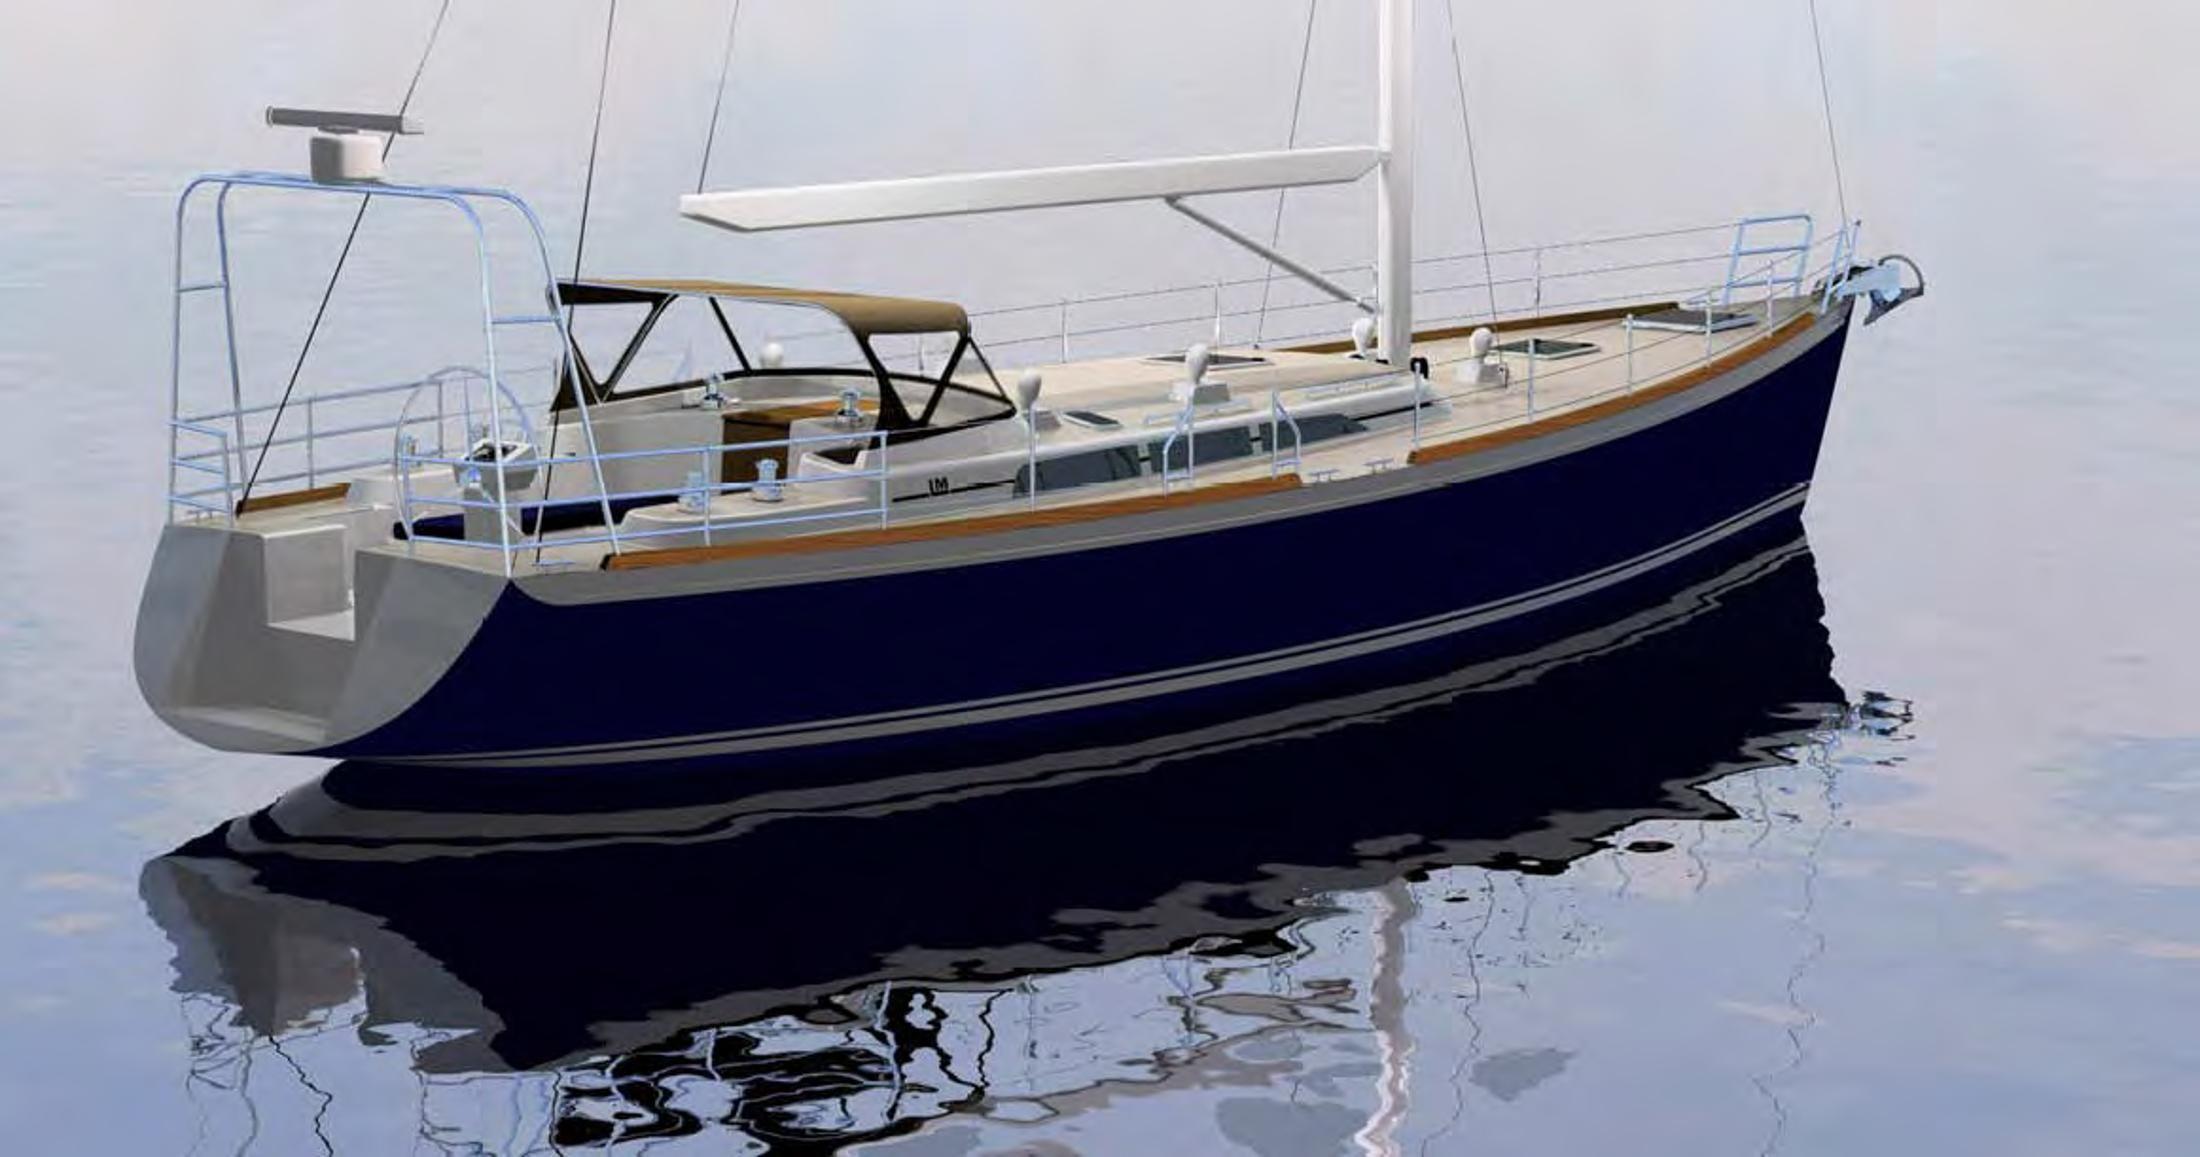 2017 Lyman Morse LM 55 - Seguin Series Sail Boat For Sale